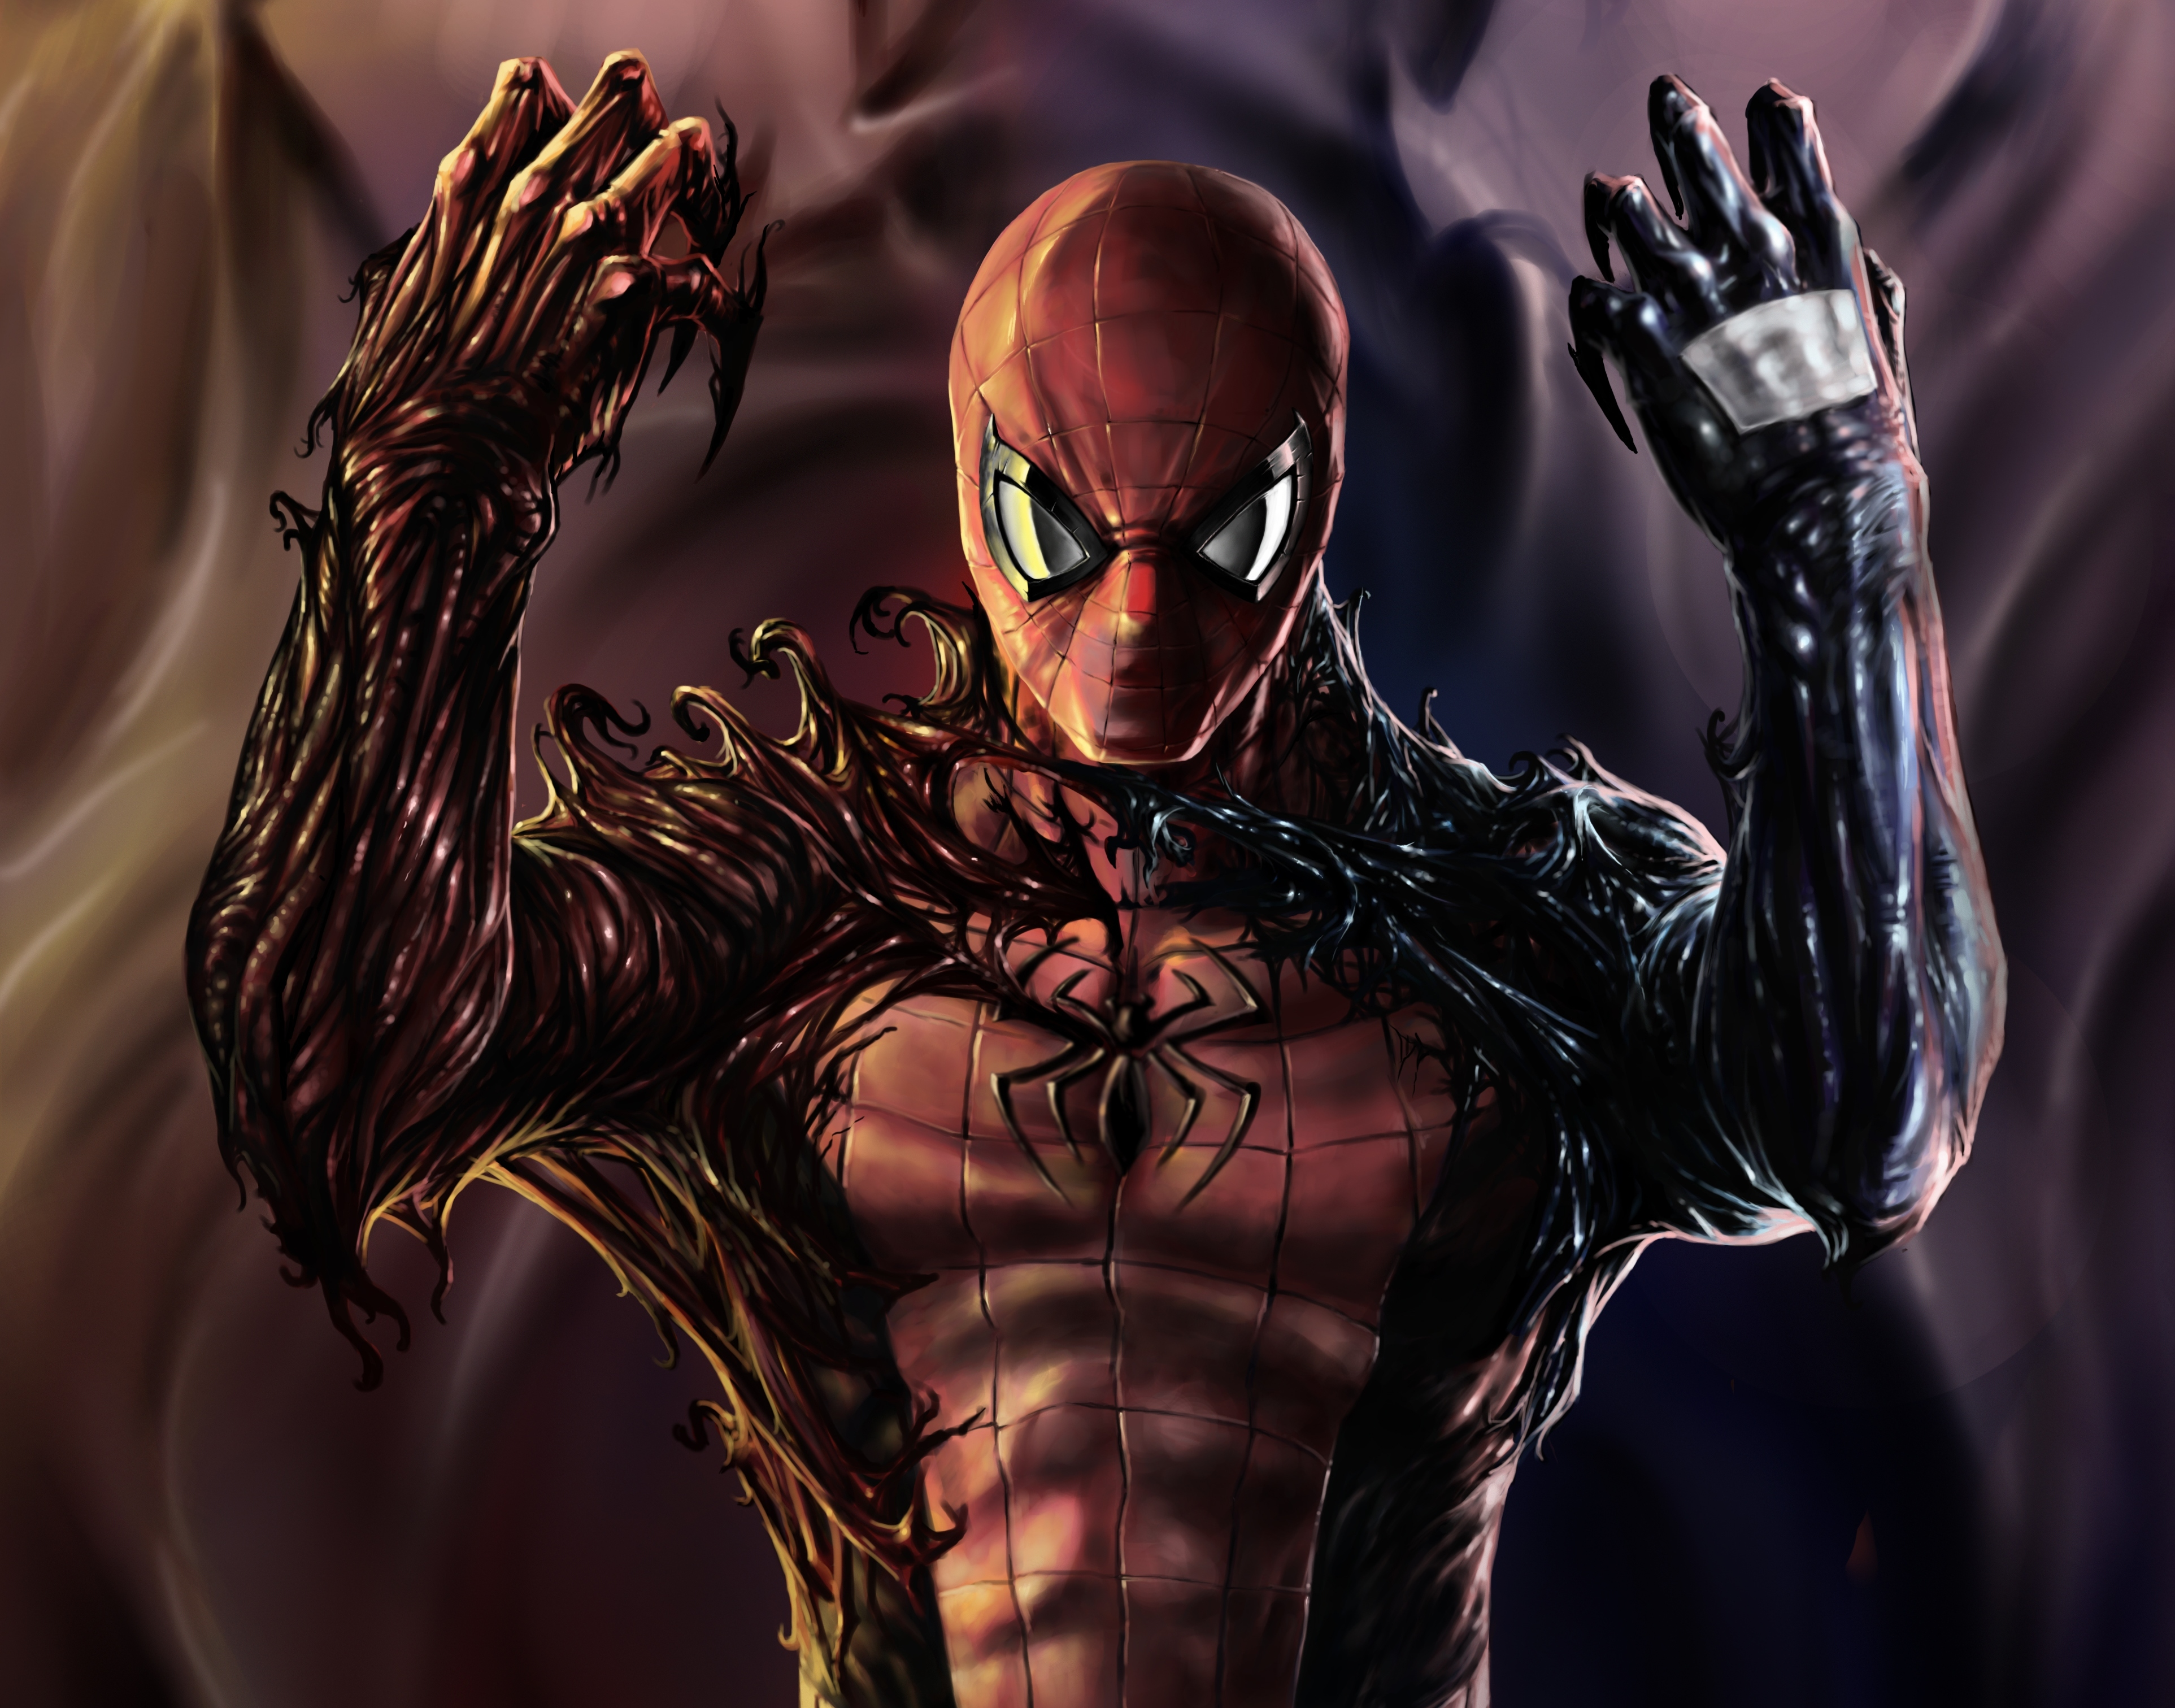 High Resolution Wallpaper | Spider-Man 3 1920x1080 px